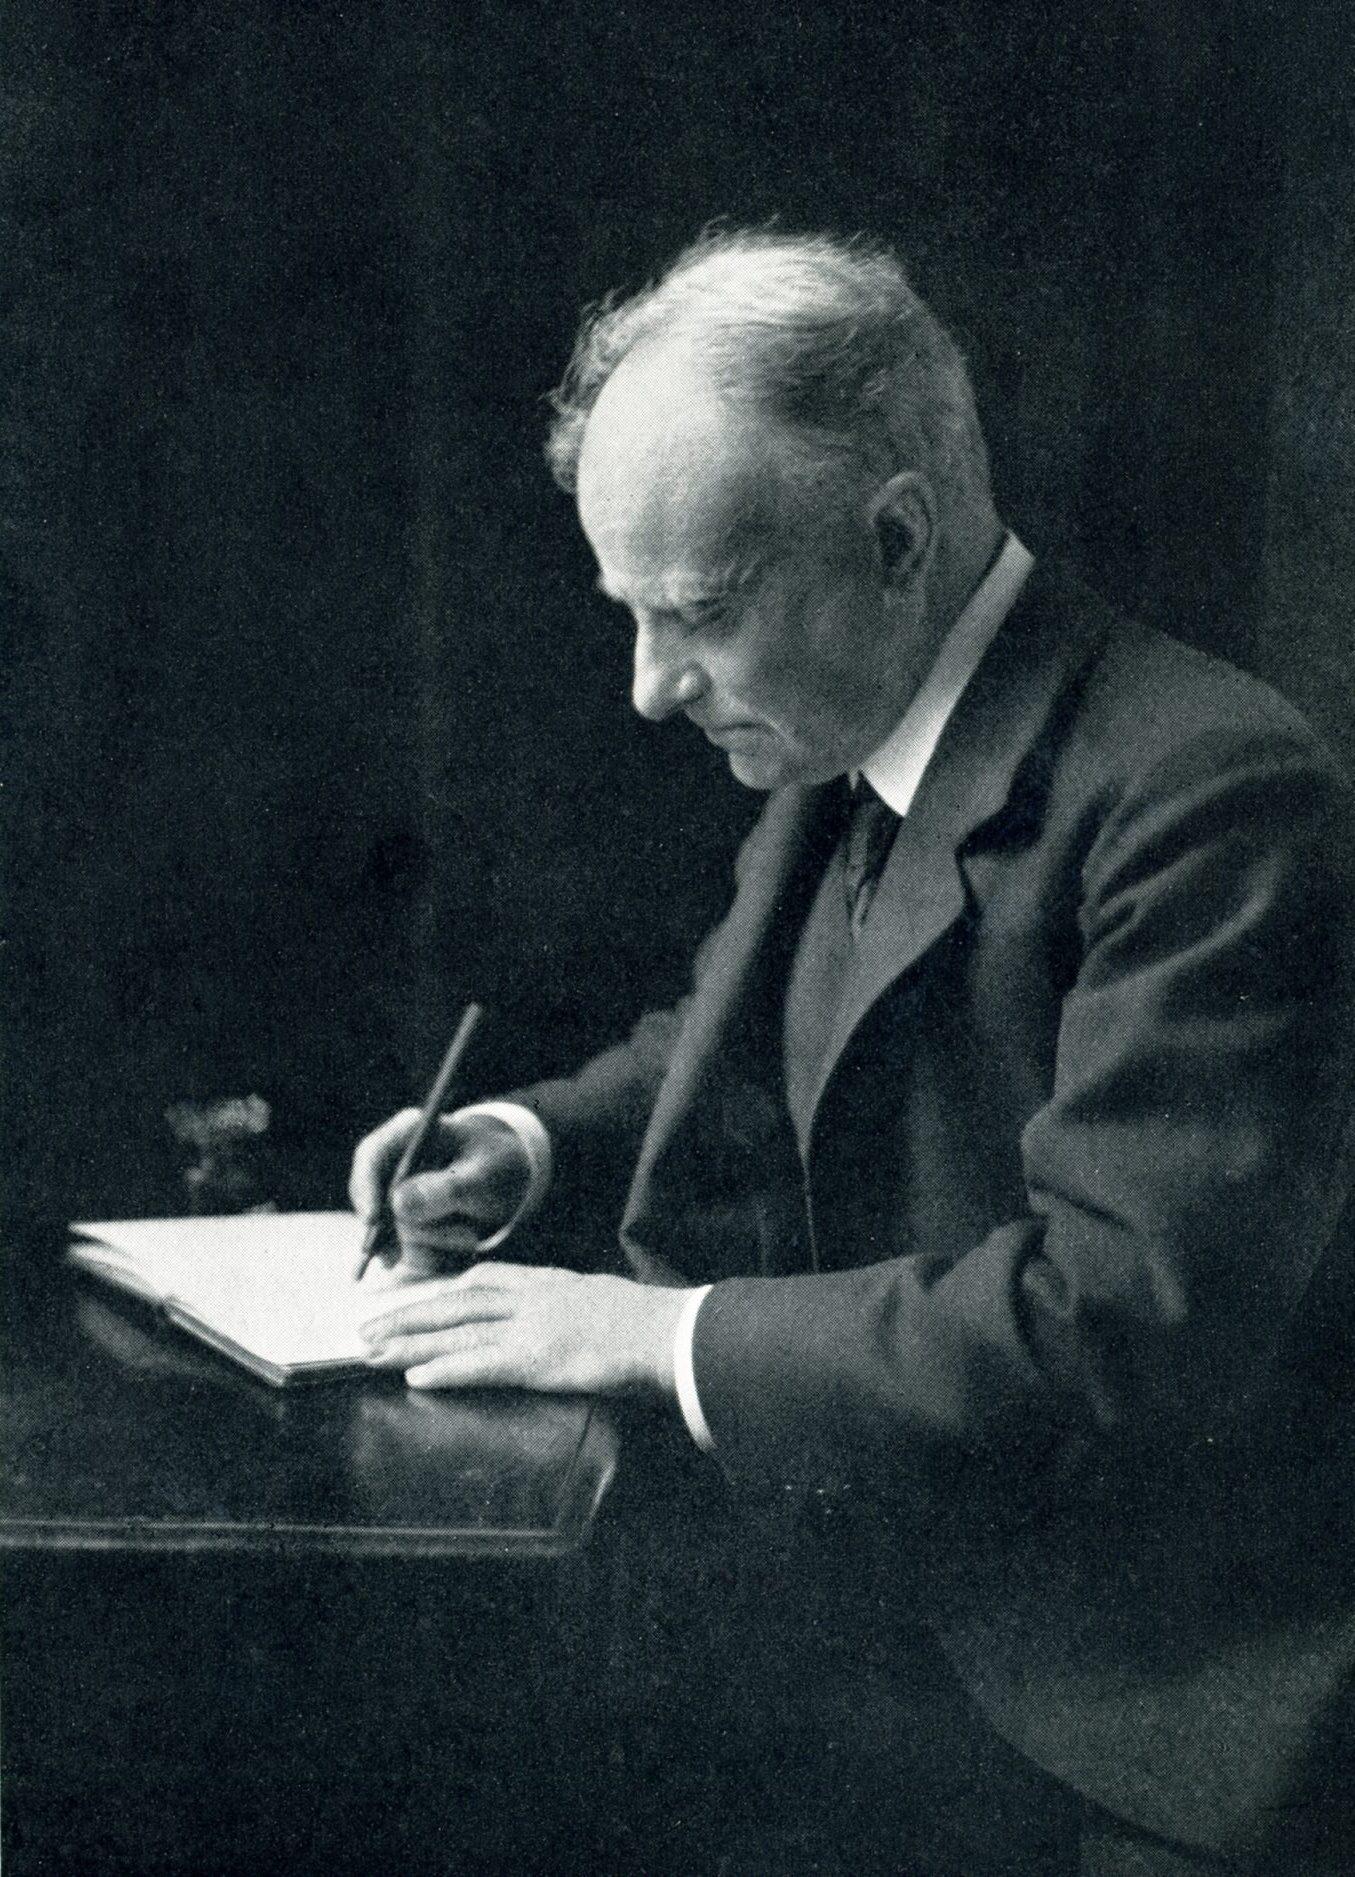 Thomson at his desk, 1912